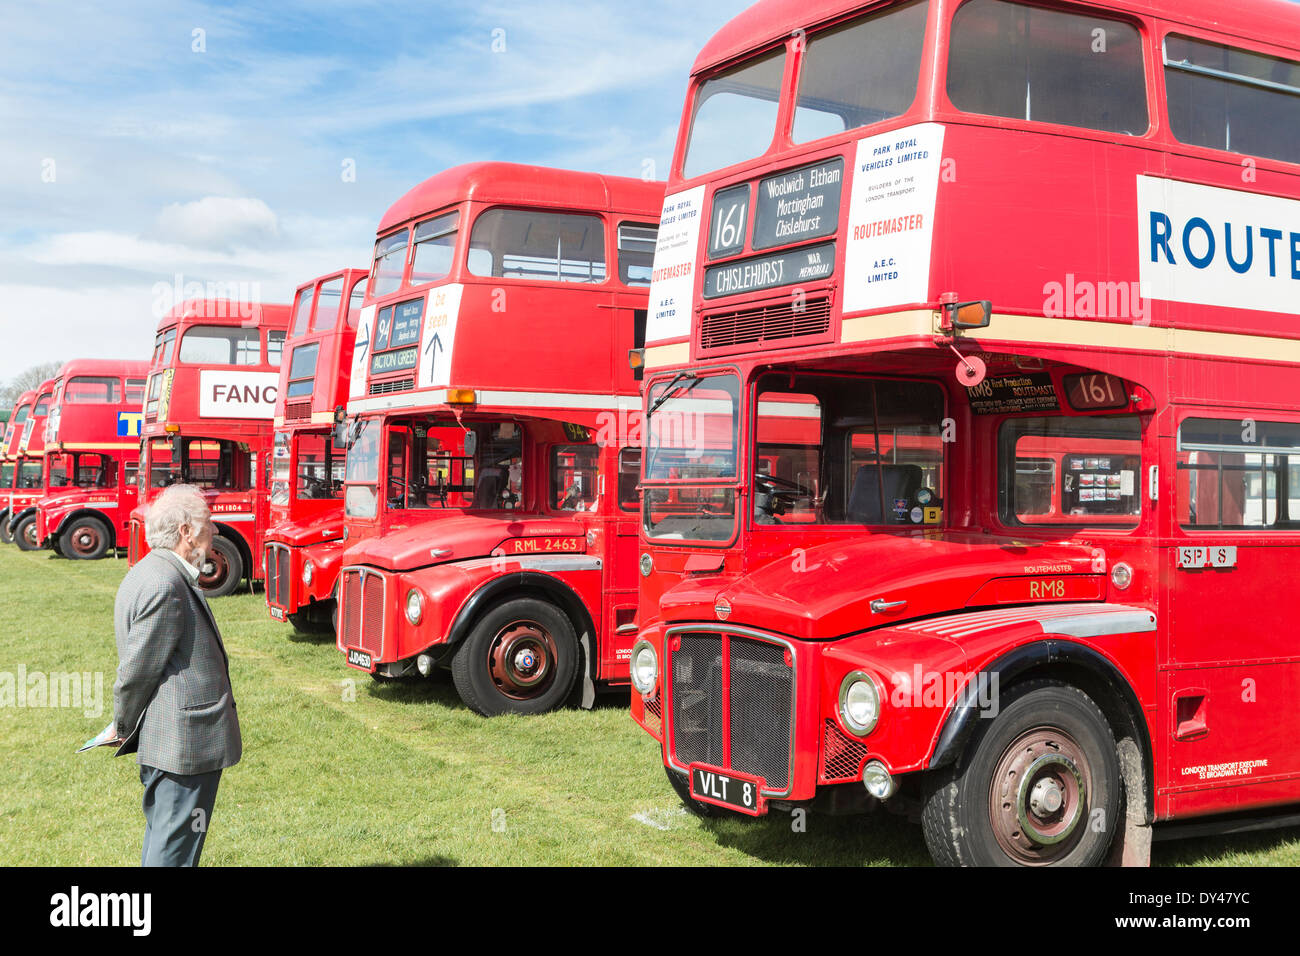 Elderly Man Reminiscing Routemaster Buses - Stock Image